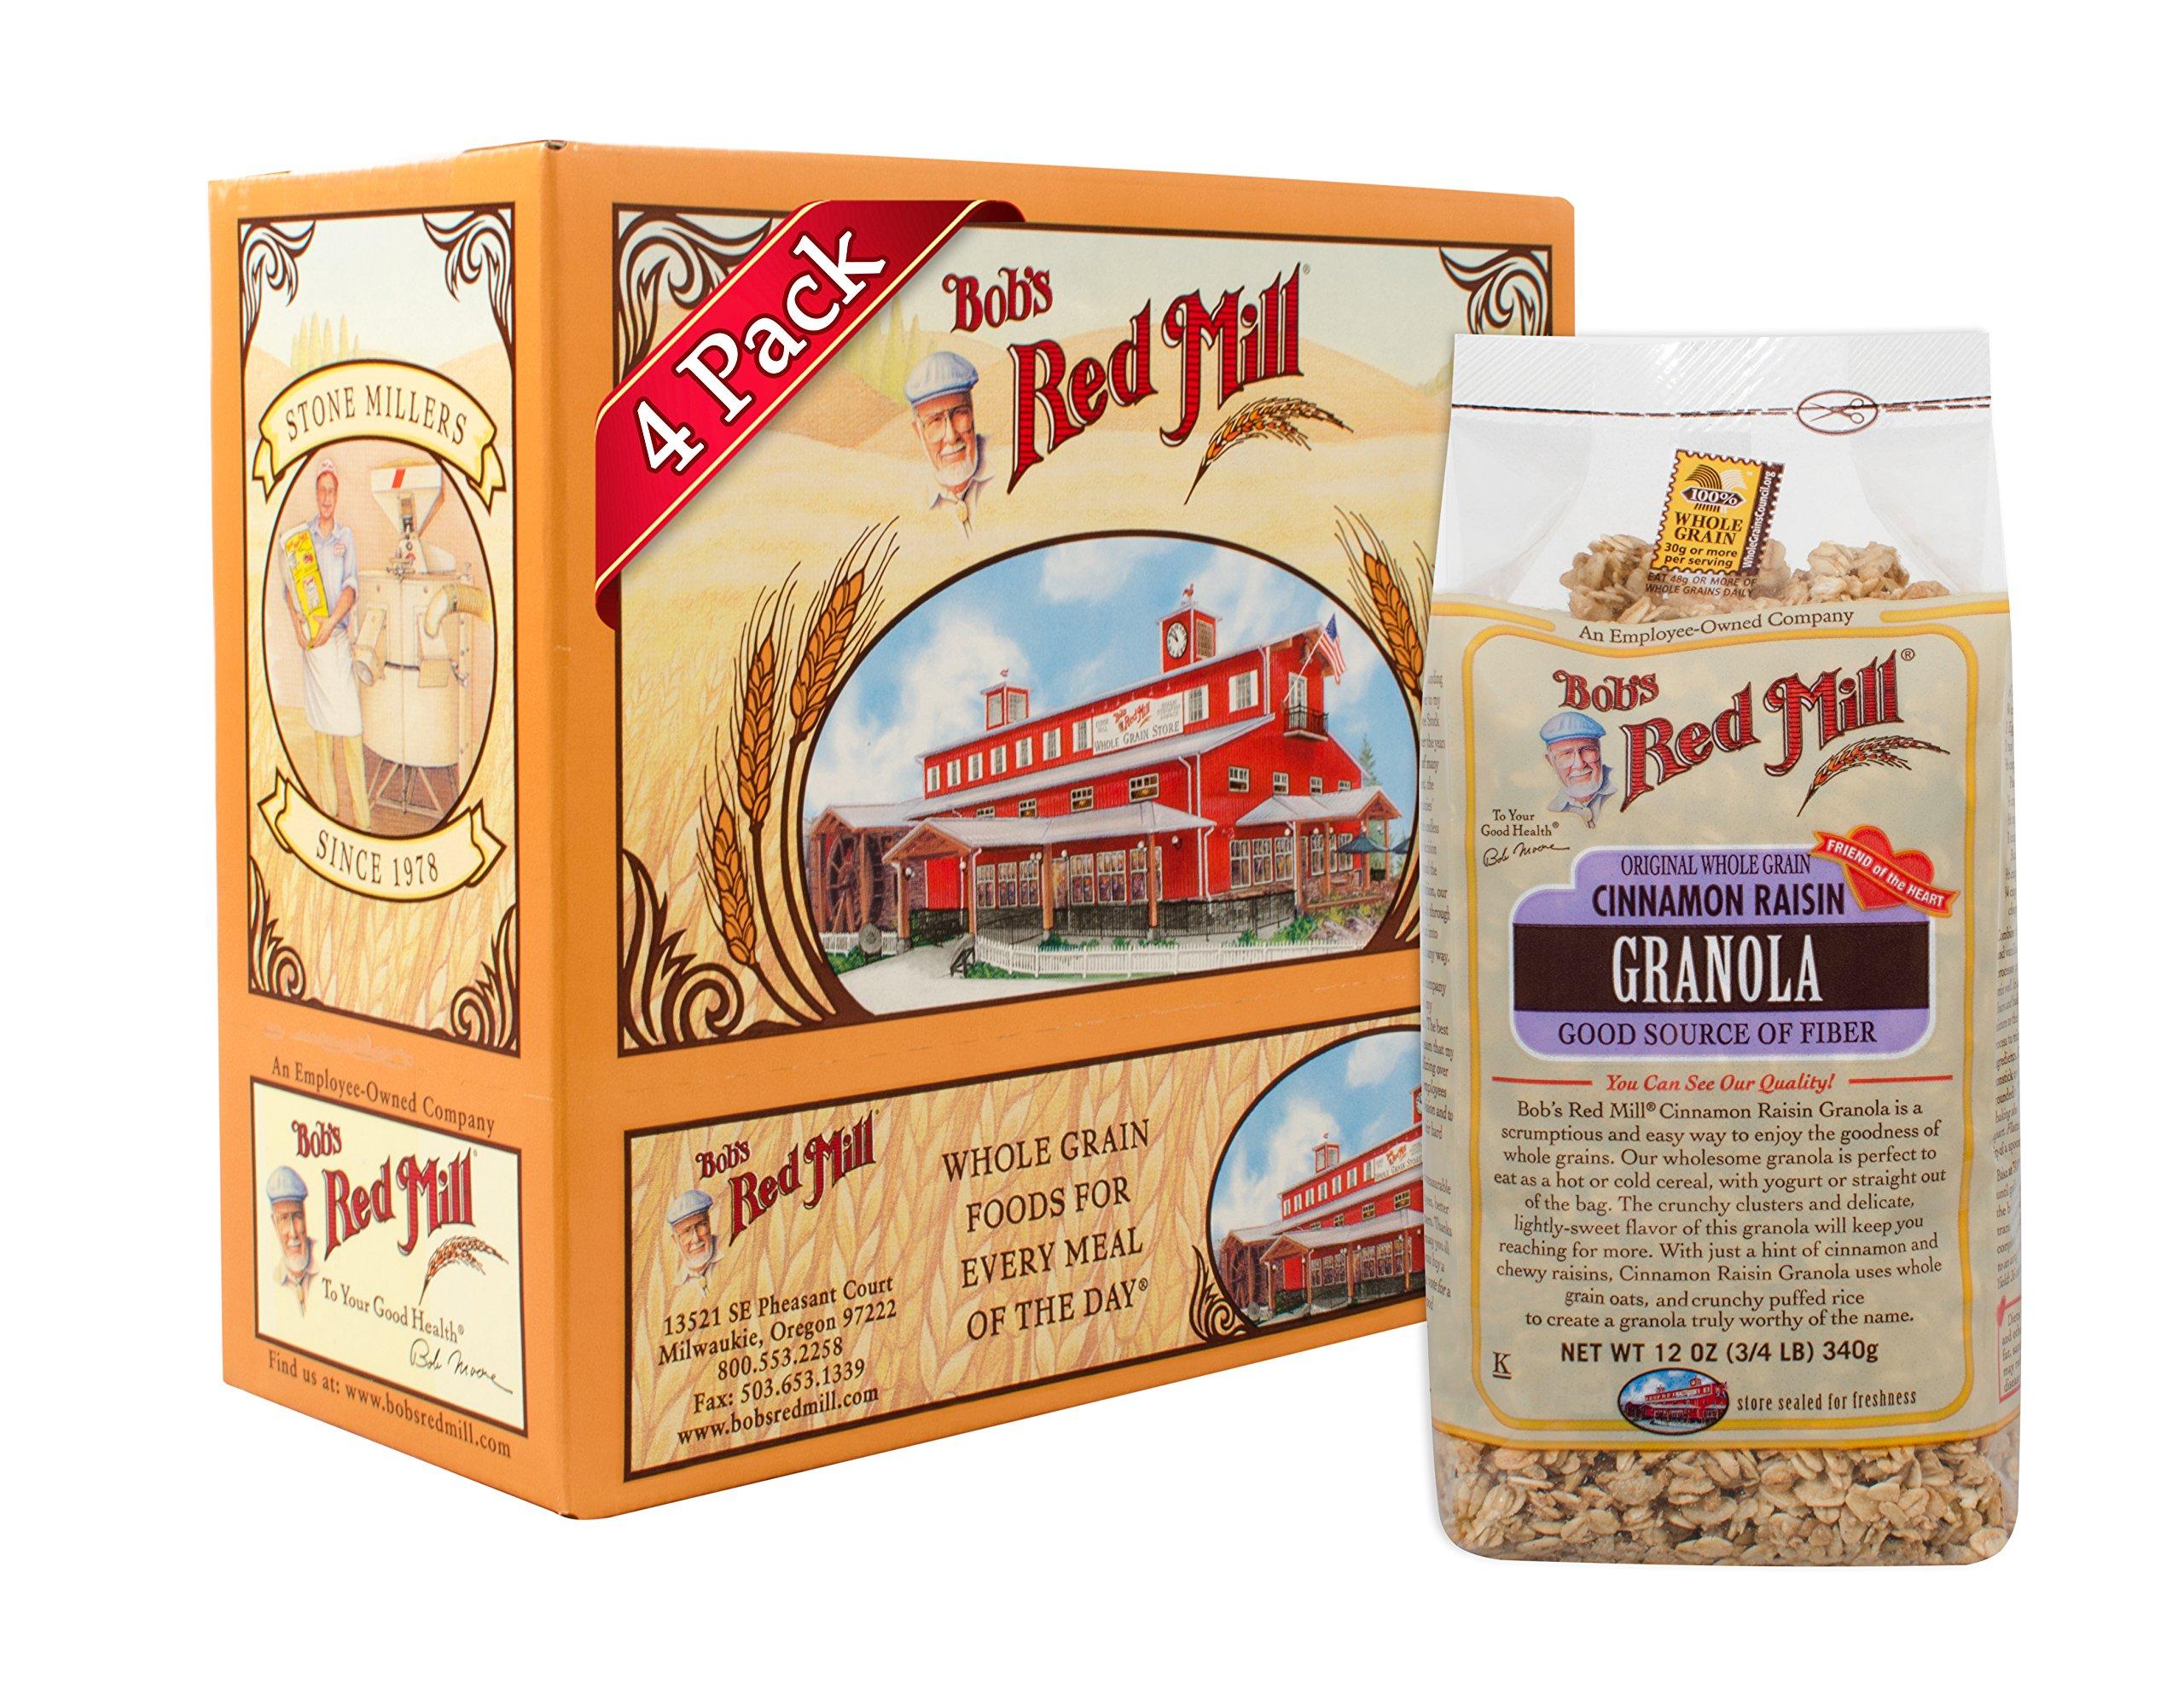 Bob's Red Mill Cinnamon Raisin Granola, 12 Ounce (Pack of 4)